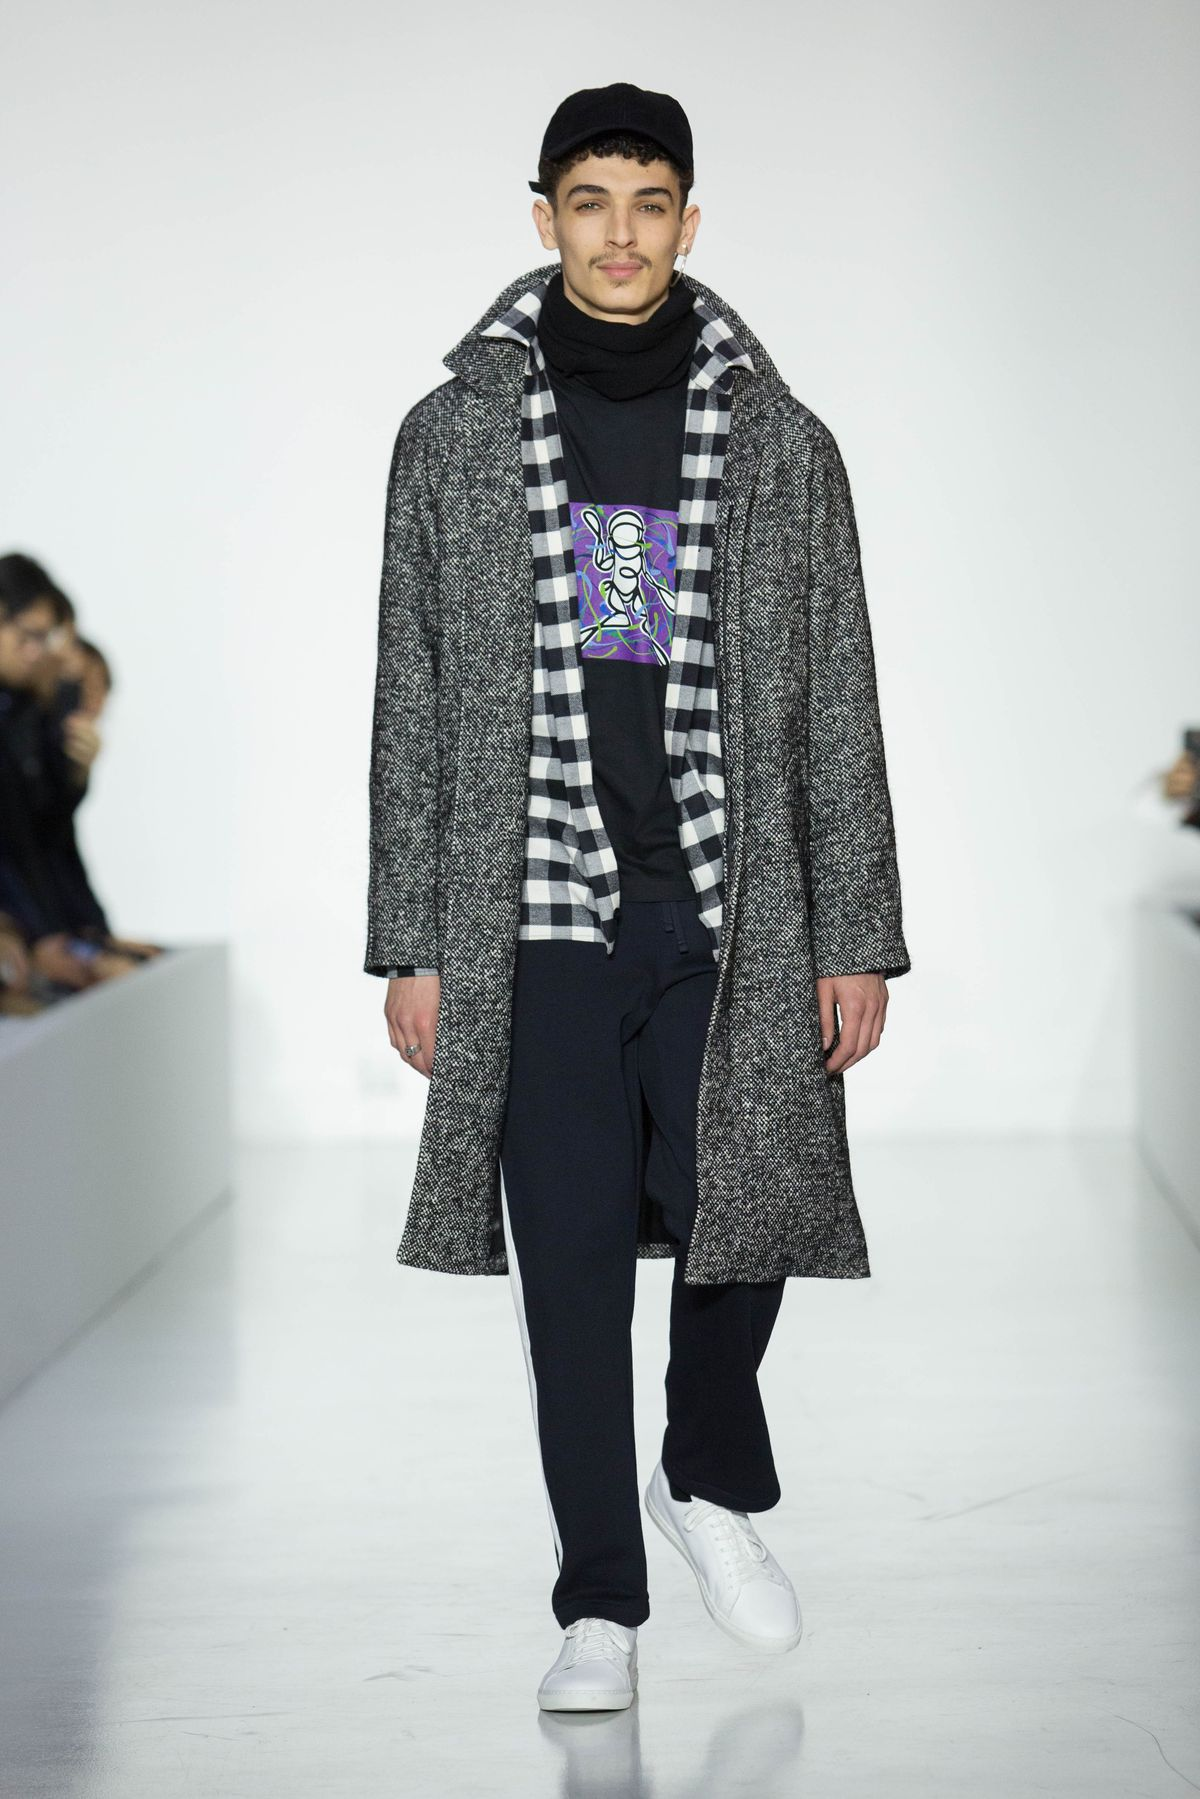 Agnés B., Menswear, Herbst Winter 2018 2019